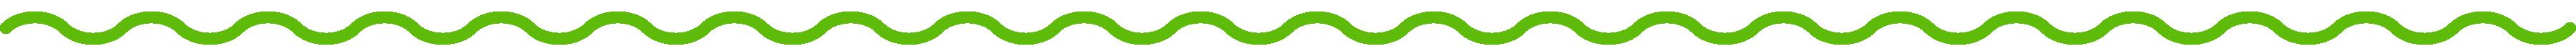 MFM Bar Squiggle Green 1